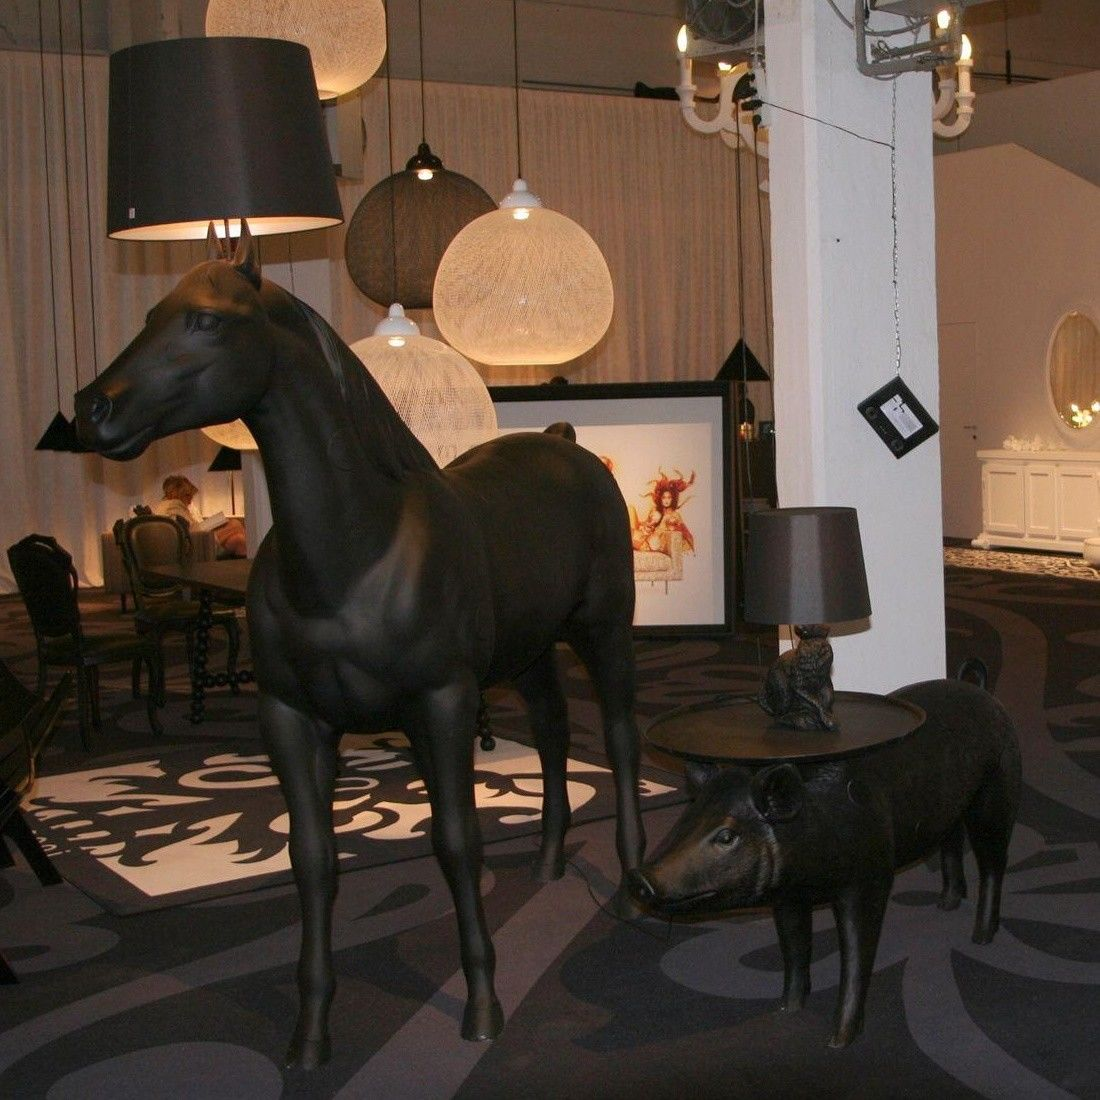 moooi horse lamp floor lamp  moooi  ambientedirectcom - moooi  moooi horse lamp floor lamp